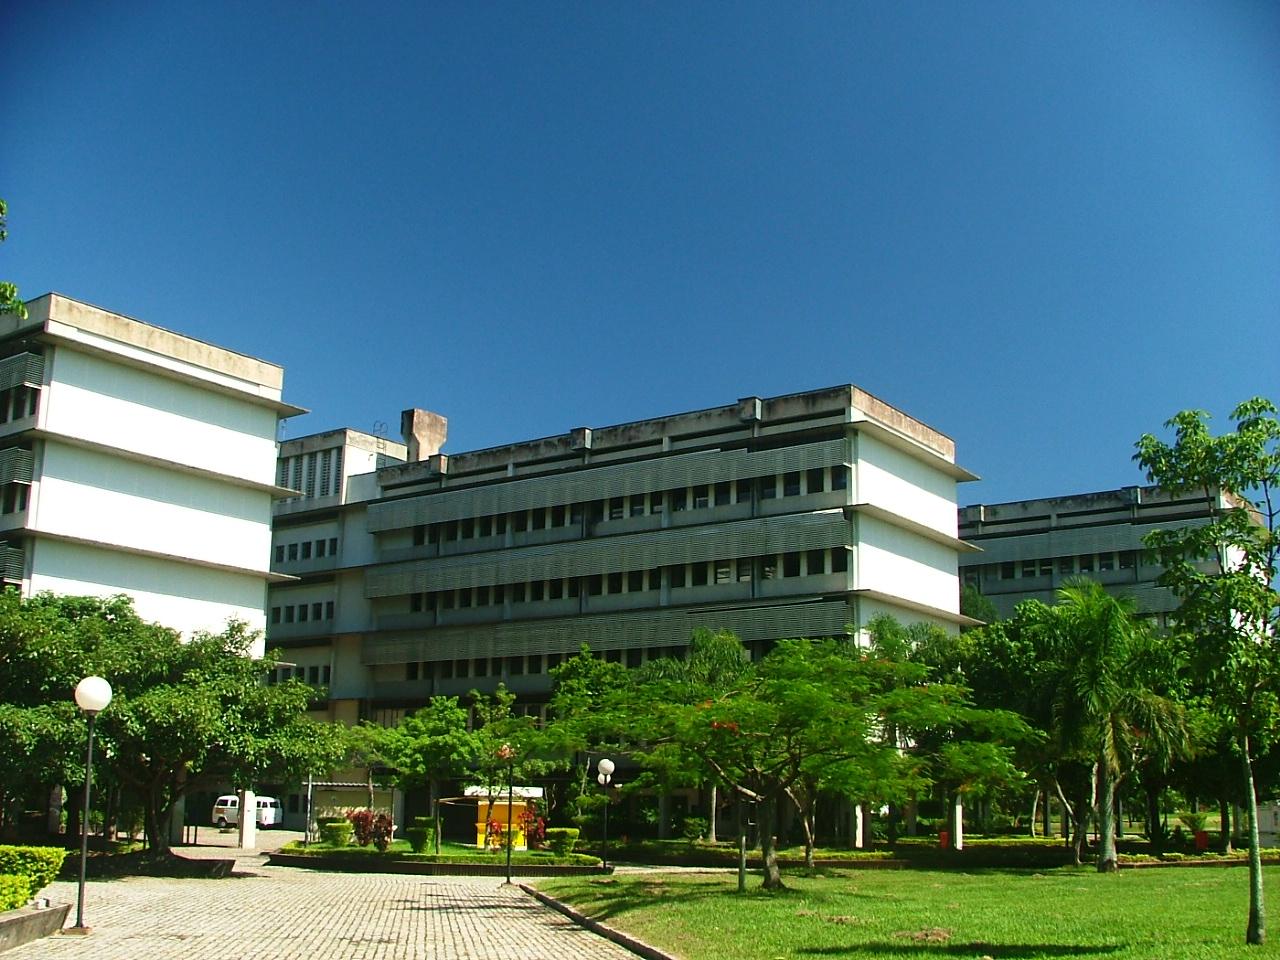 Foto do Campus do Gragoatá - Niterói/RJ